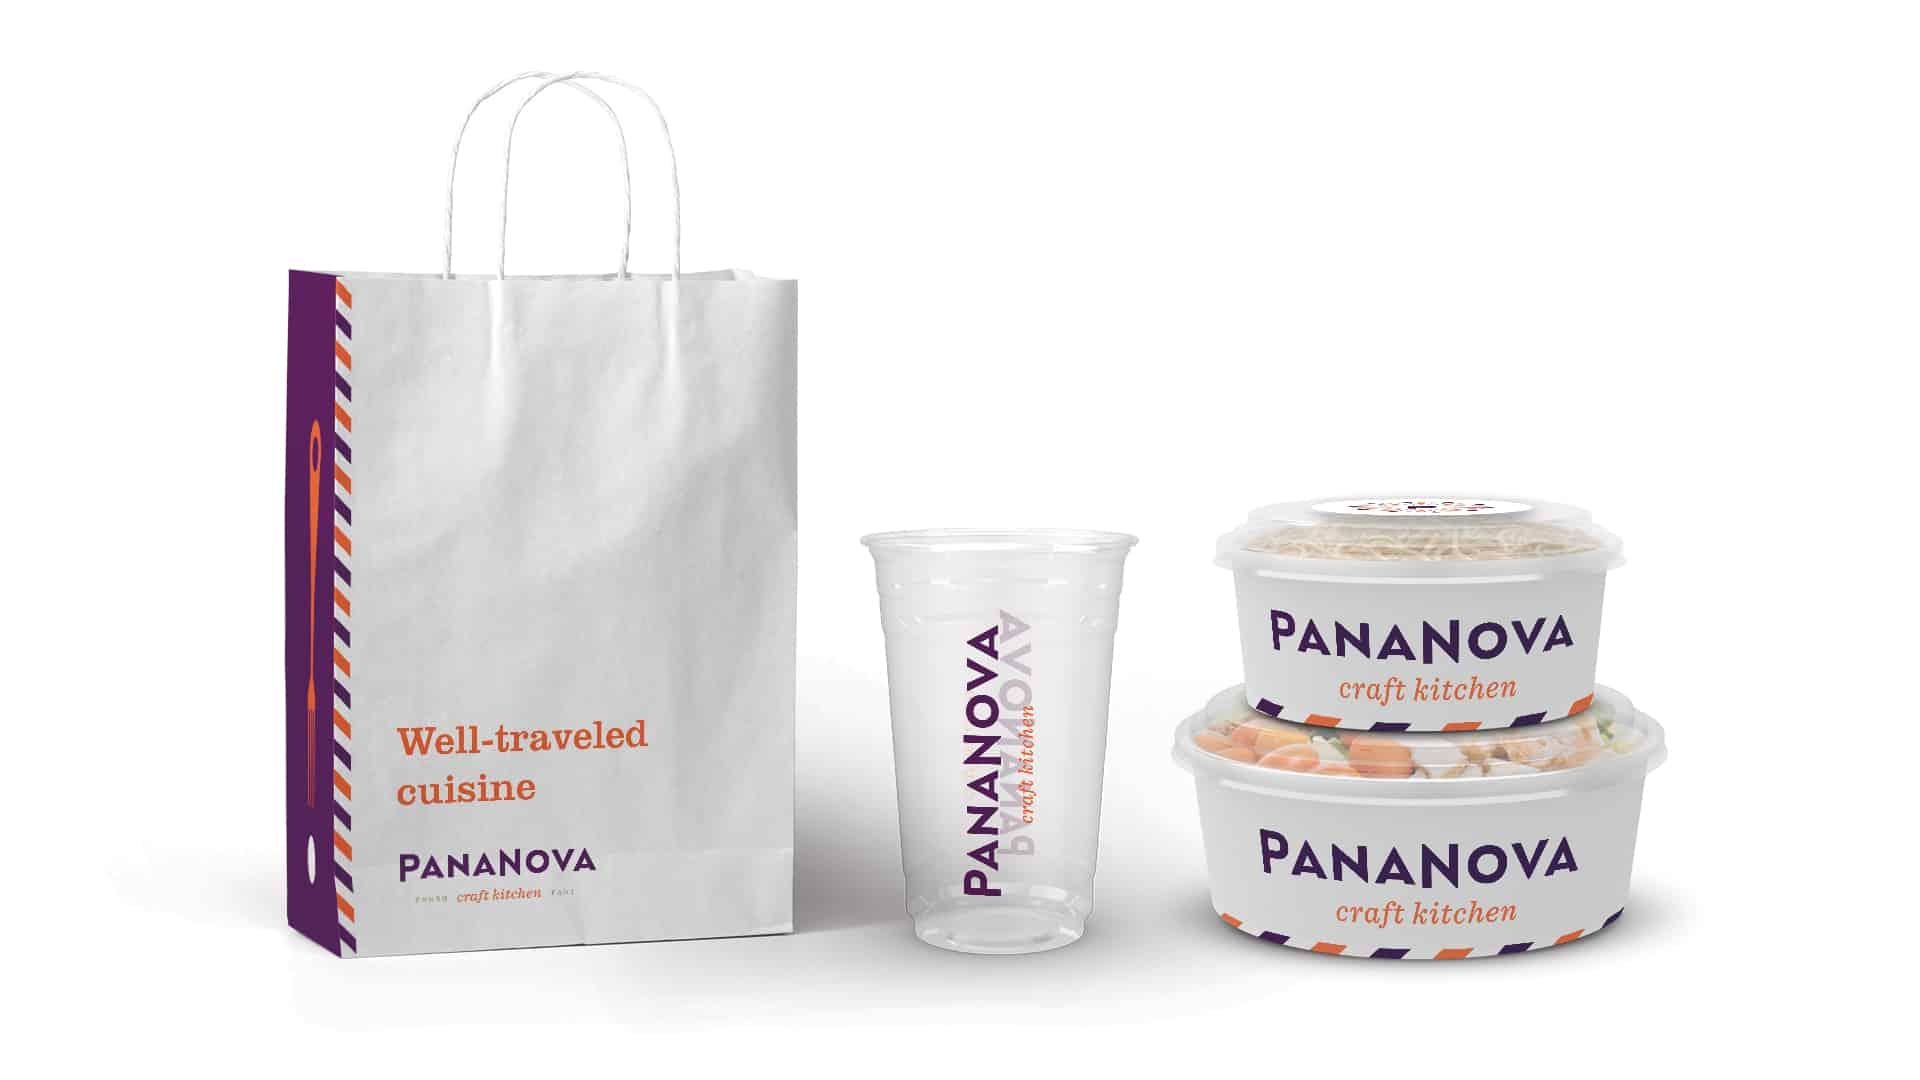 PanaNova craft kitchen fast casual restaurant branding